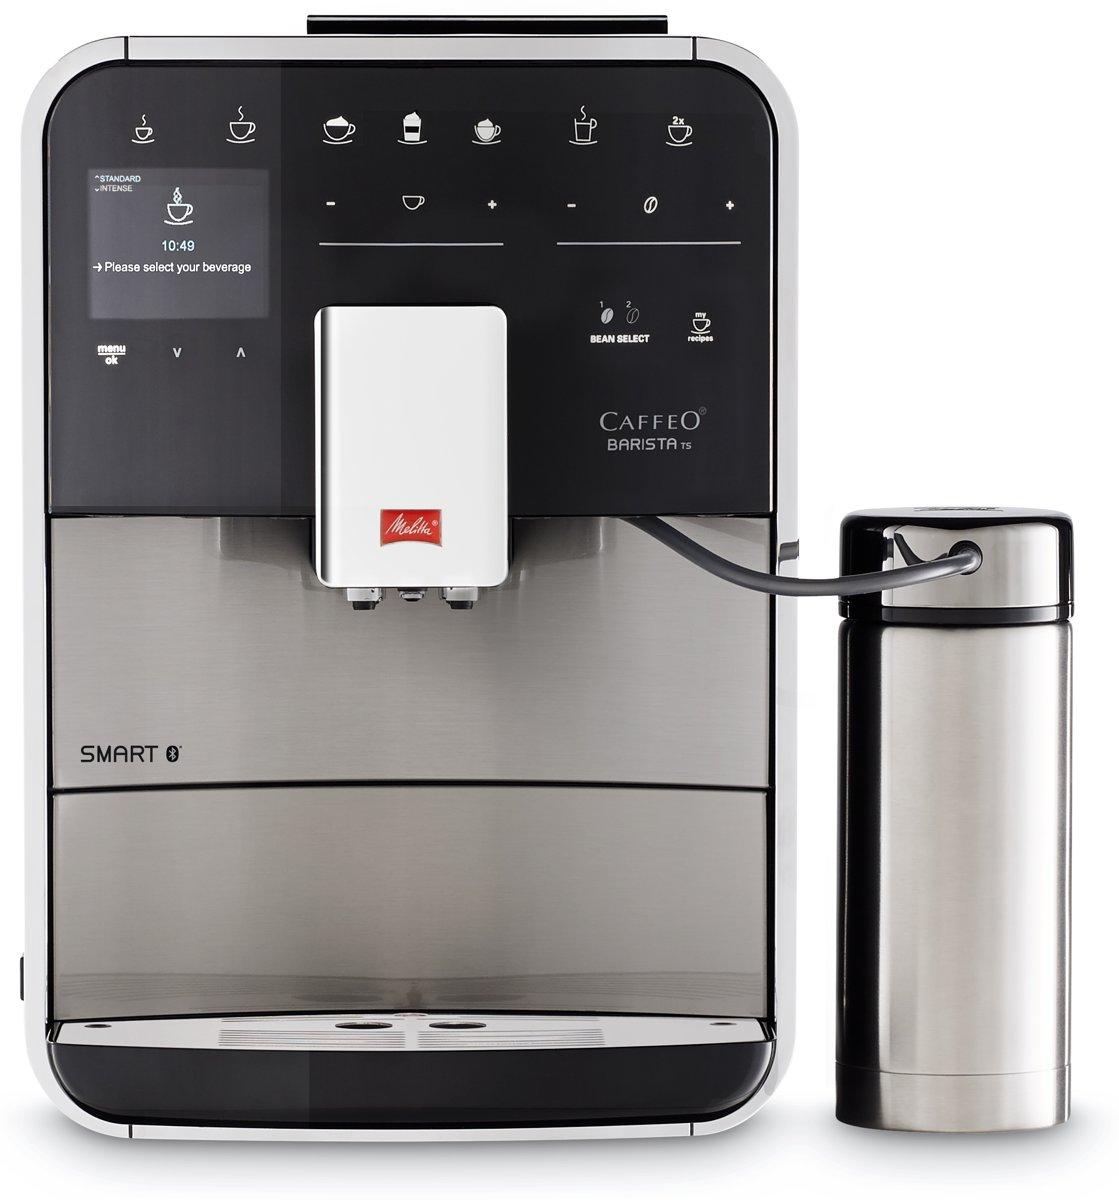 Melitta Barista Smart TS SST  F860-100 - Epressomachine - Zilver/zwart kopen